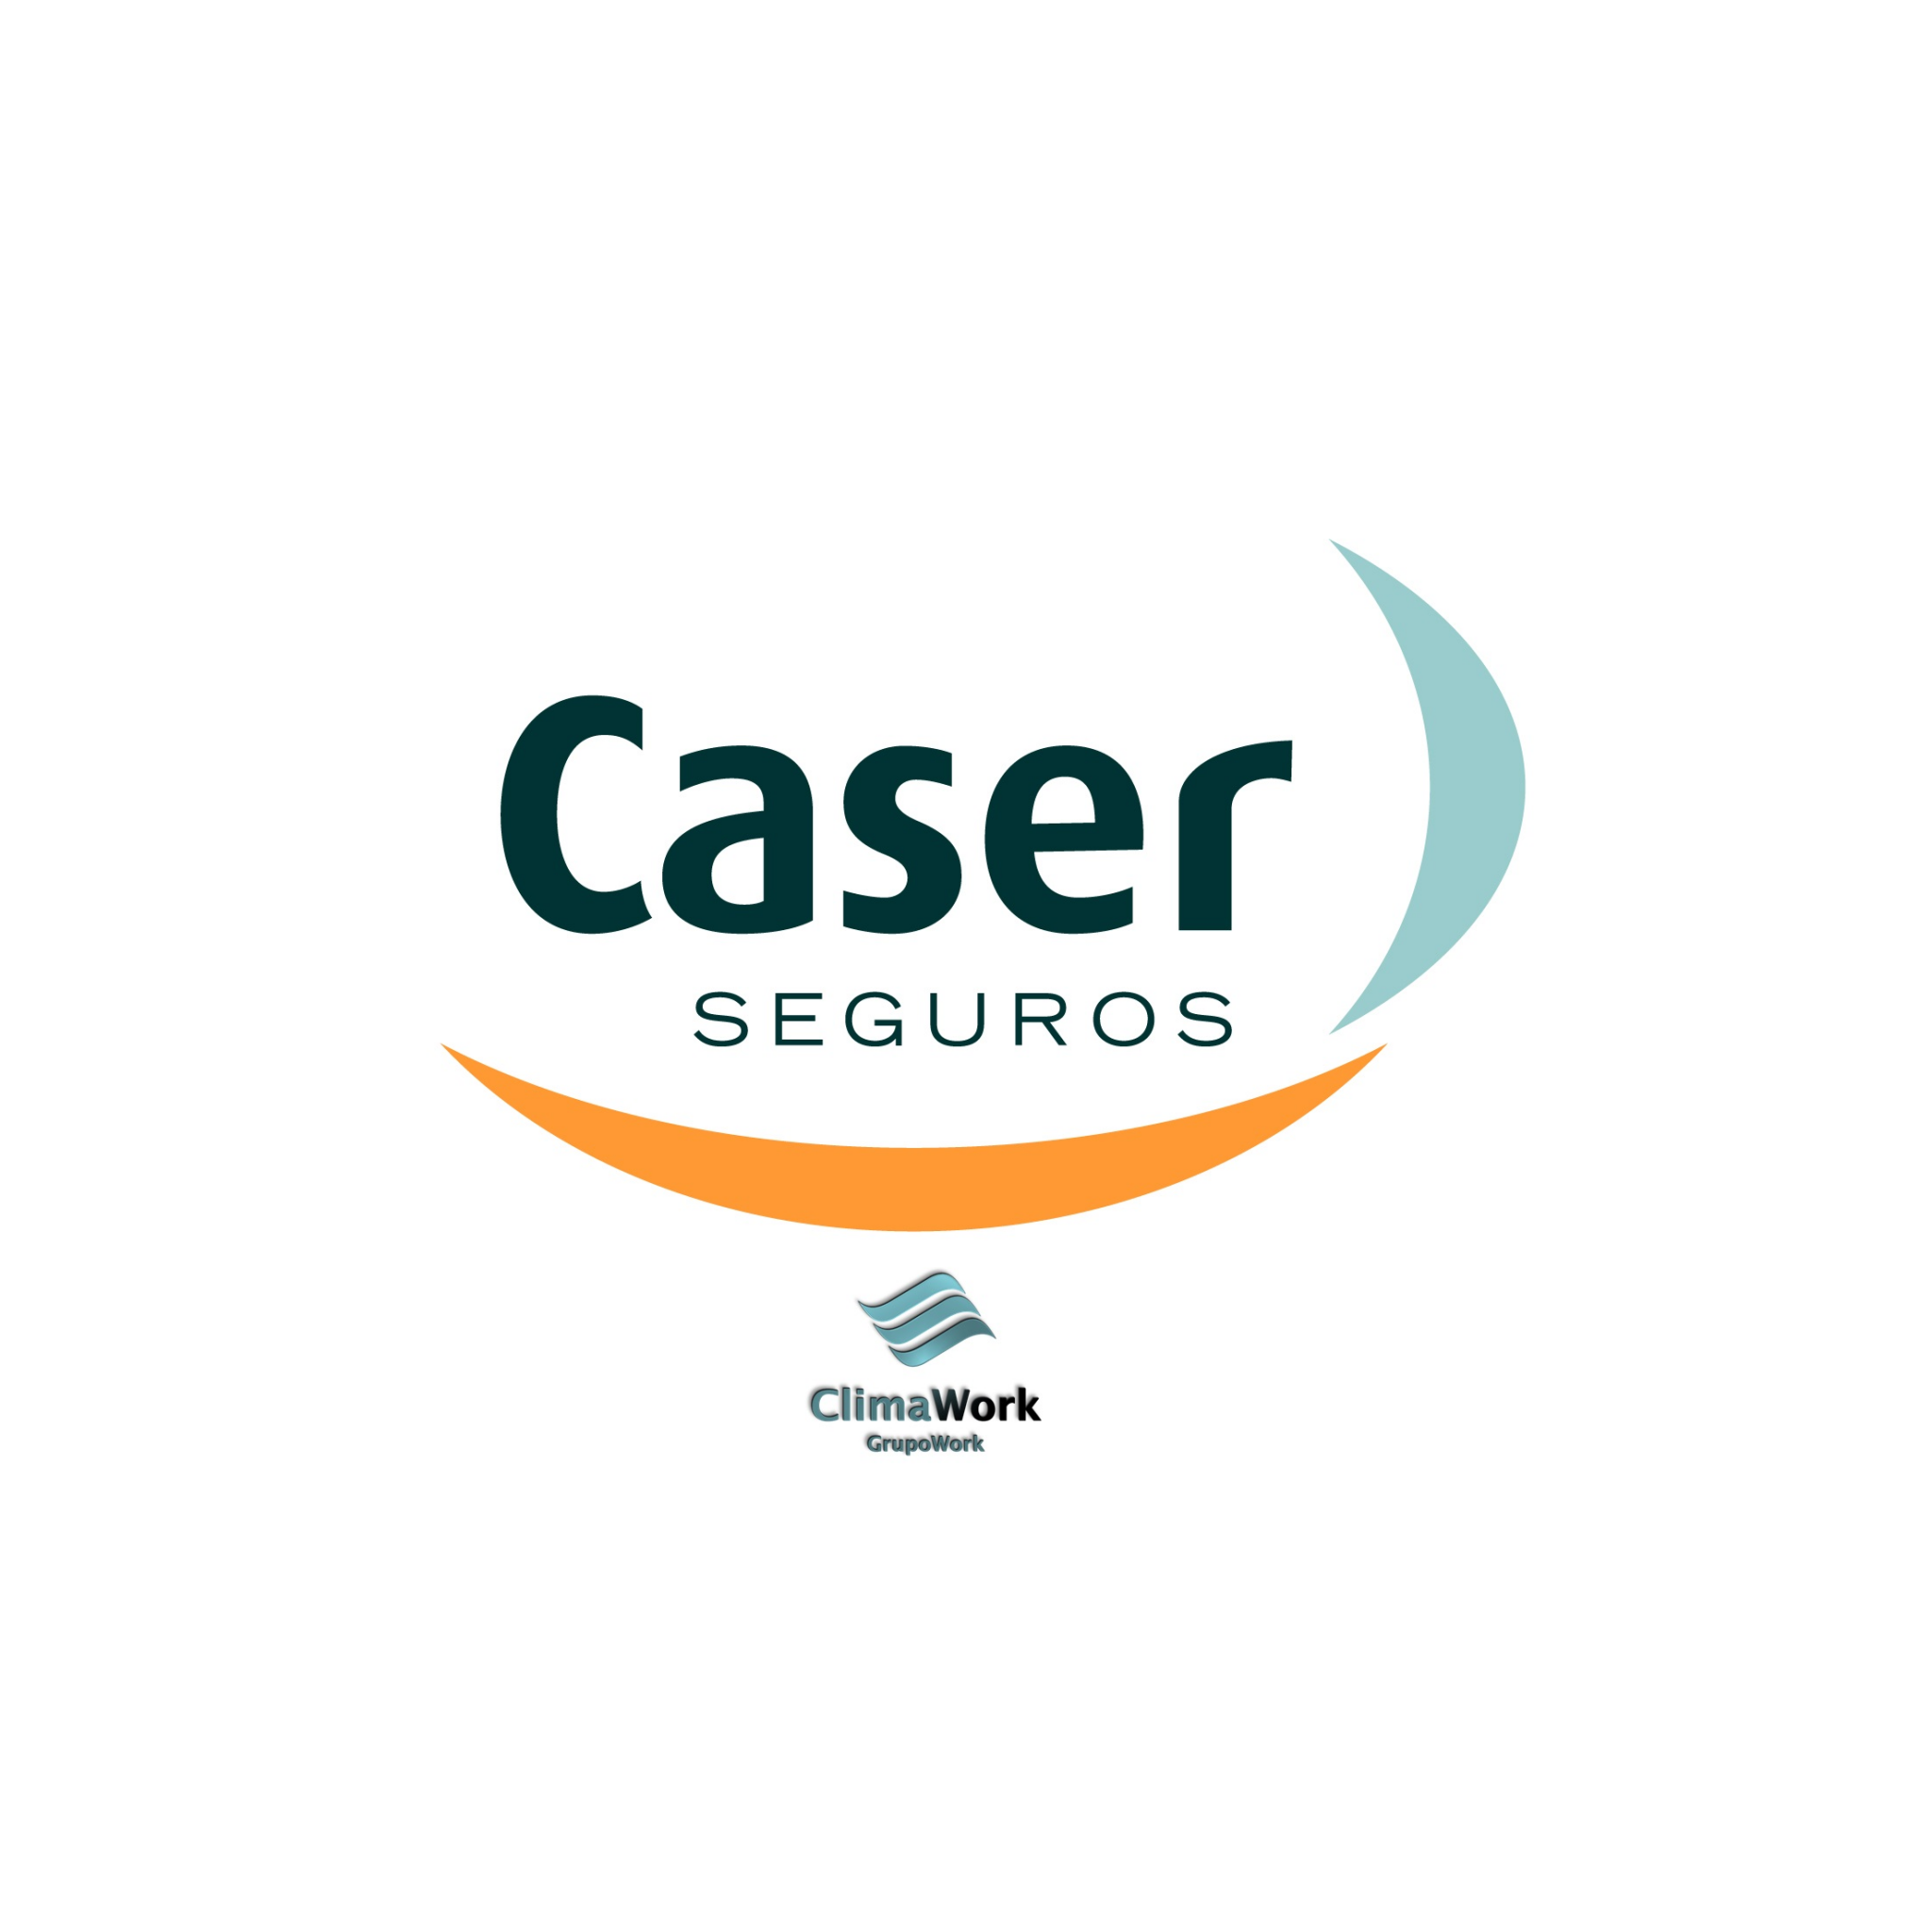 Maintenance caser seguros grupowork for Oficinas caser